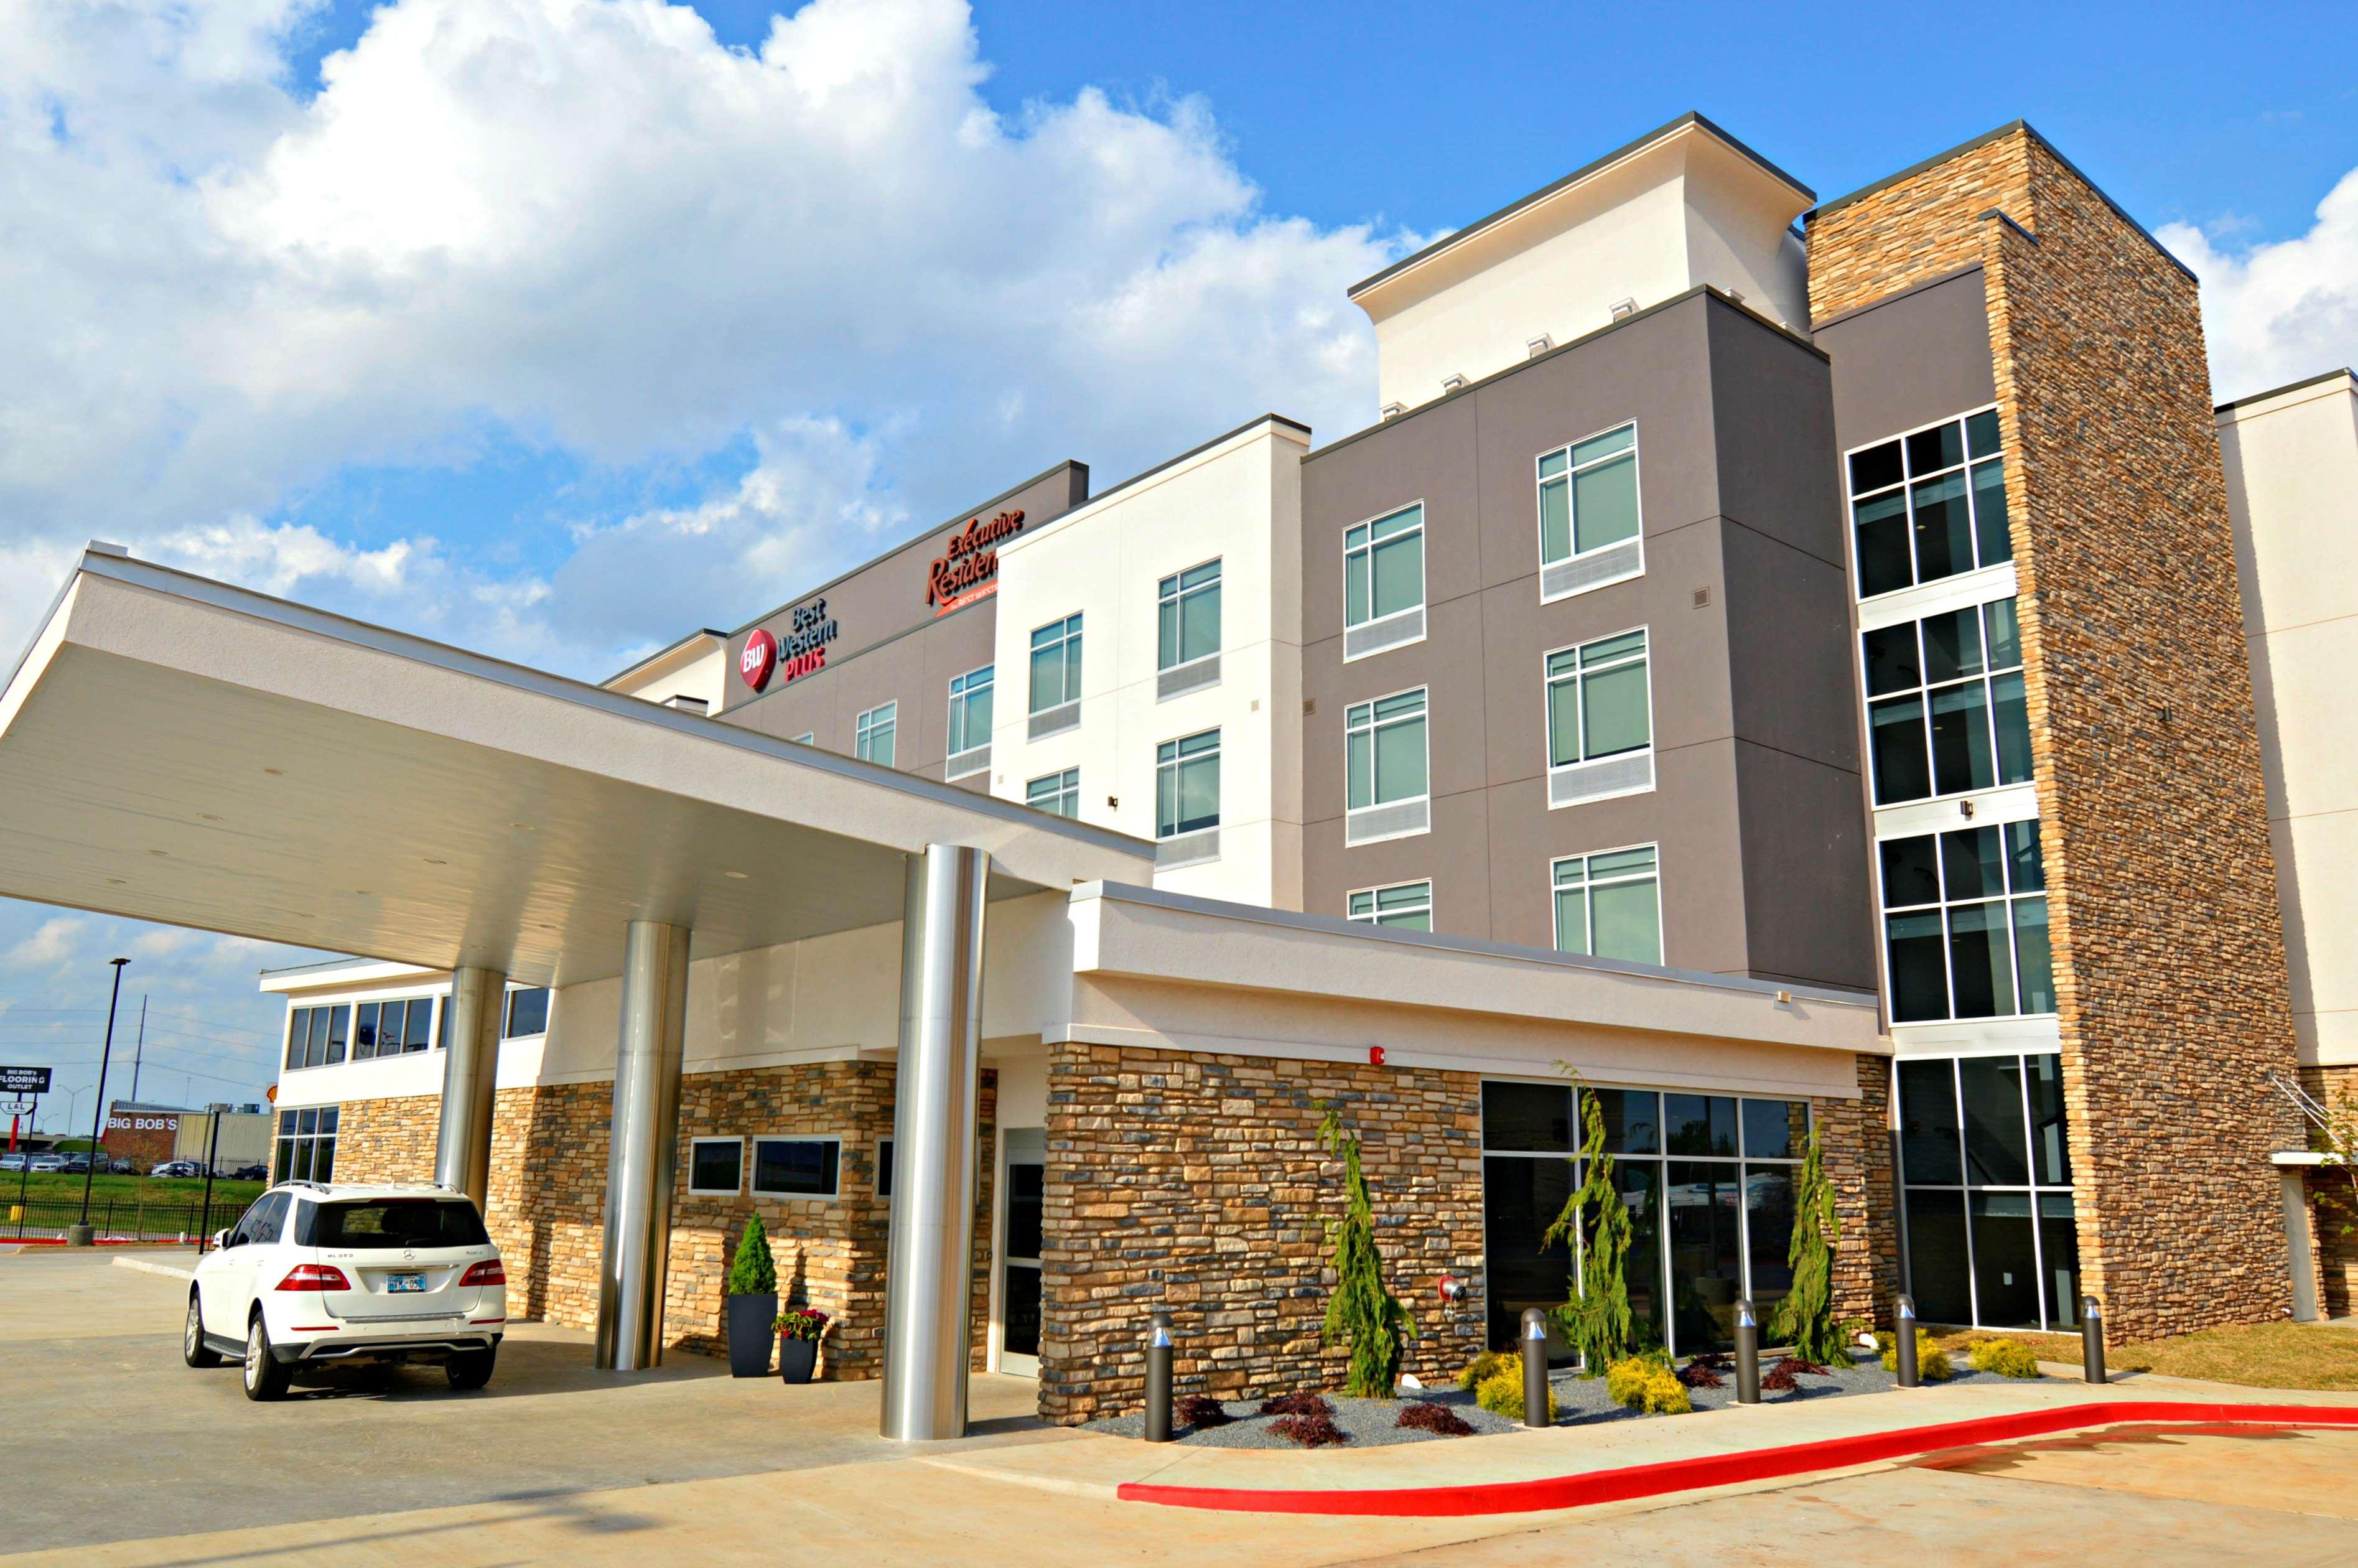 B/W Plus Executive Residency Oklahoma City I-35, Oklahoma